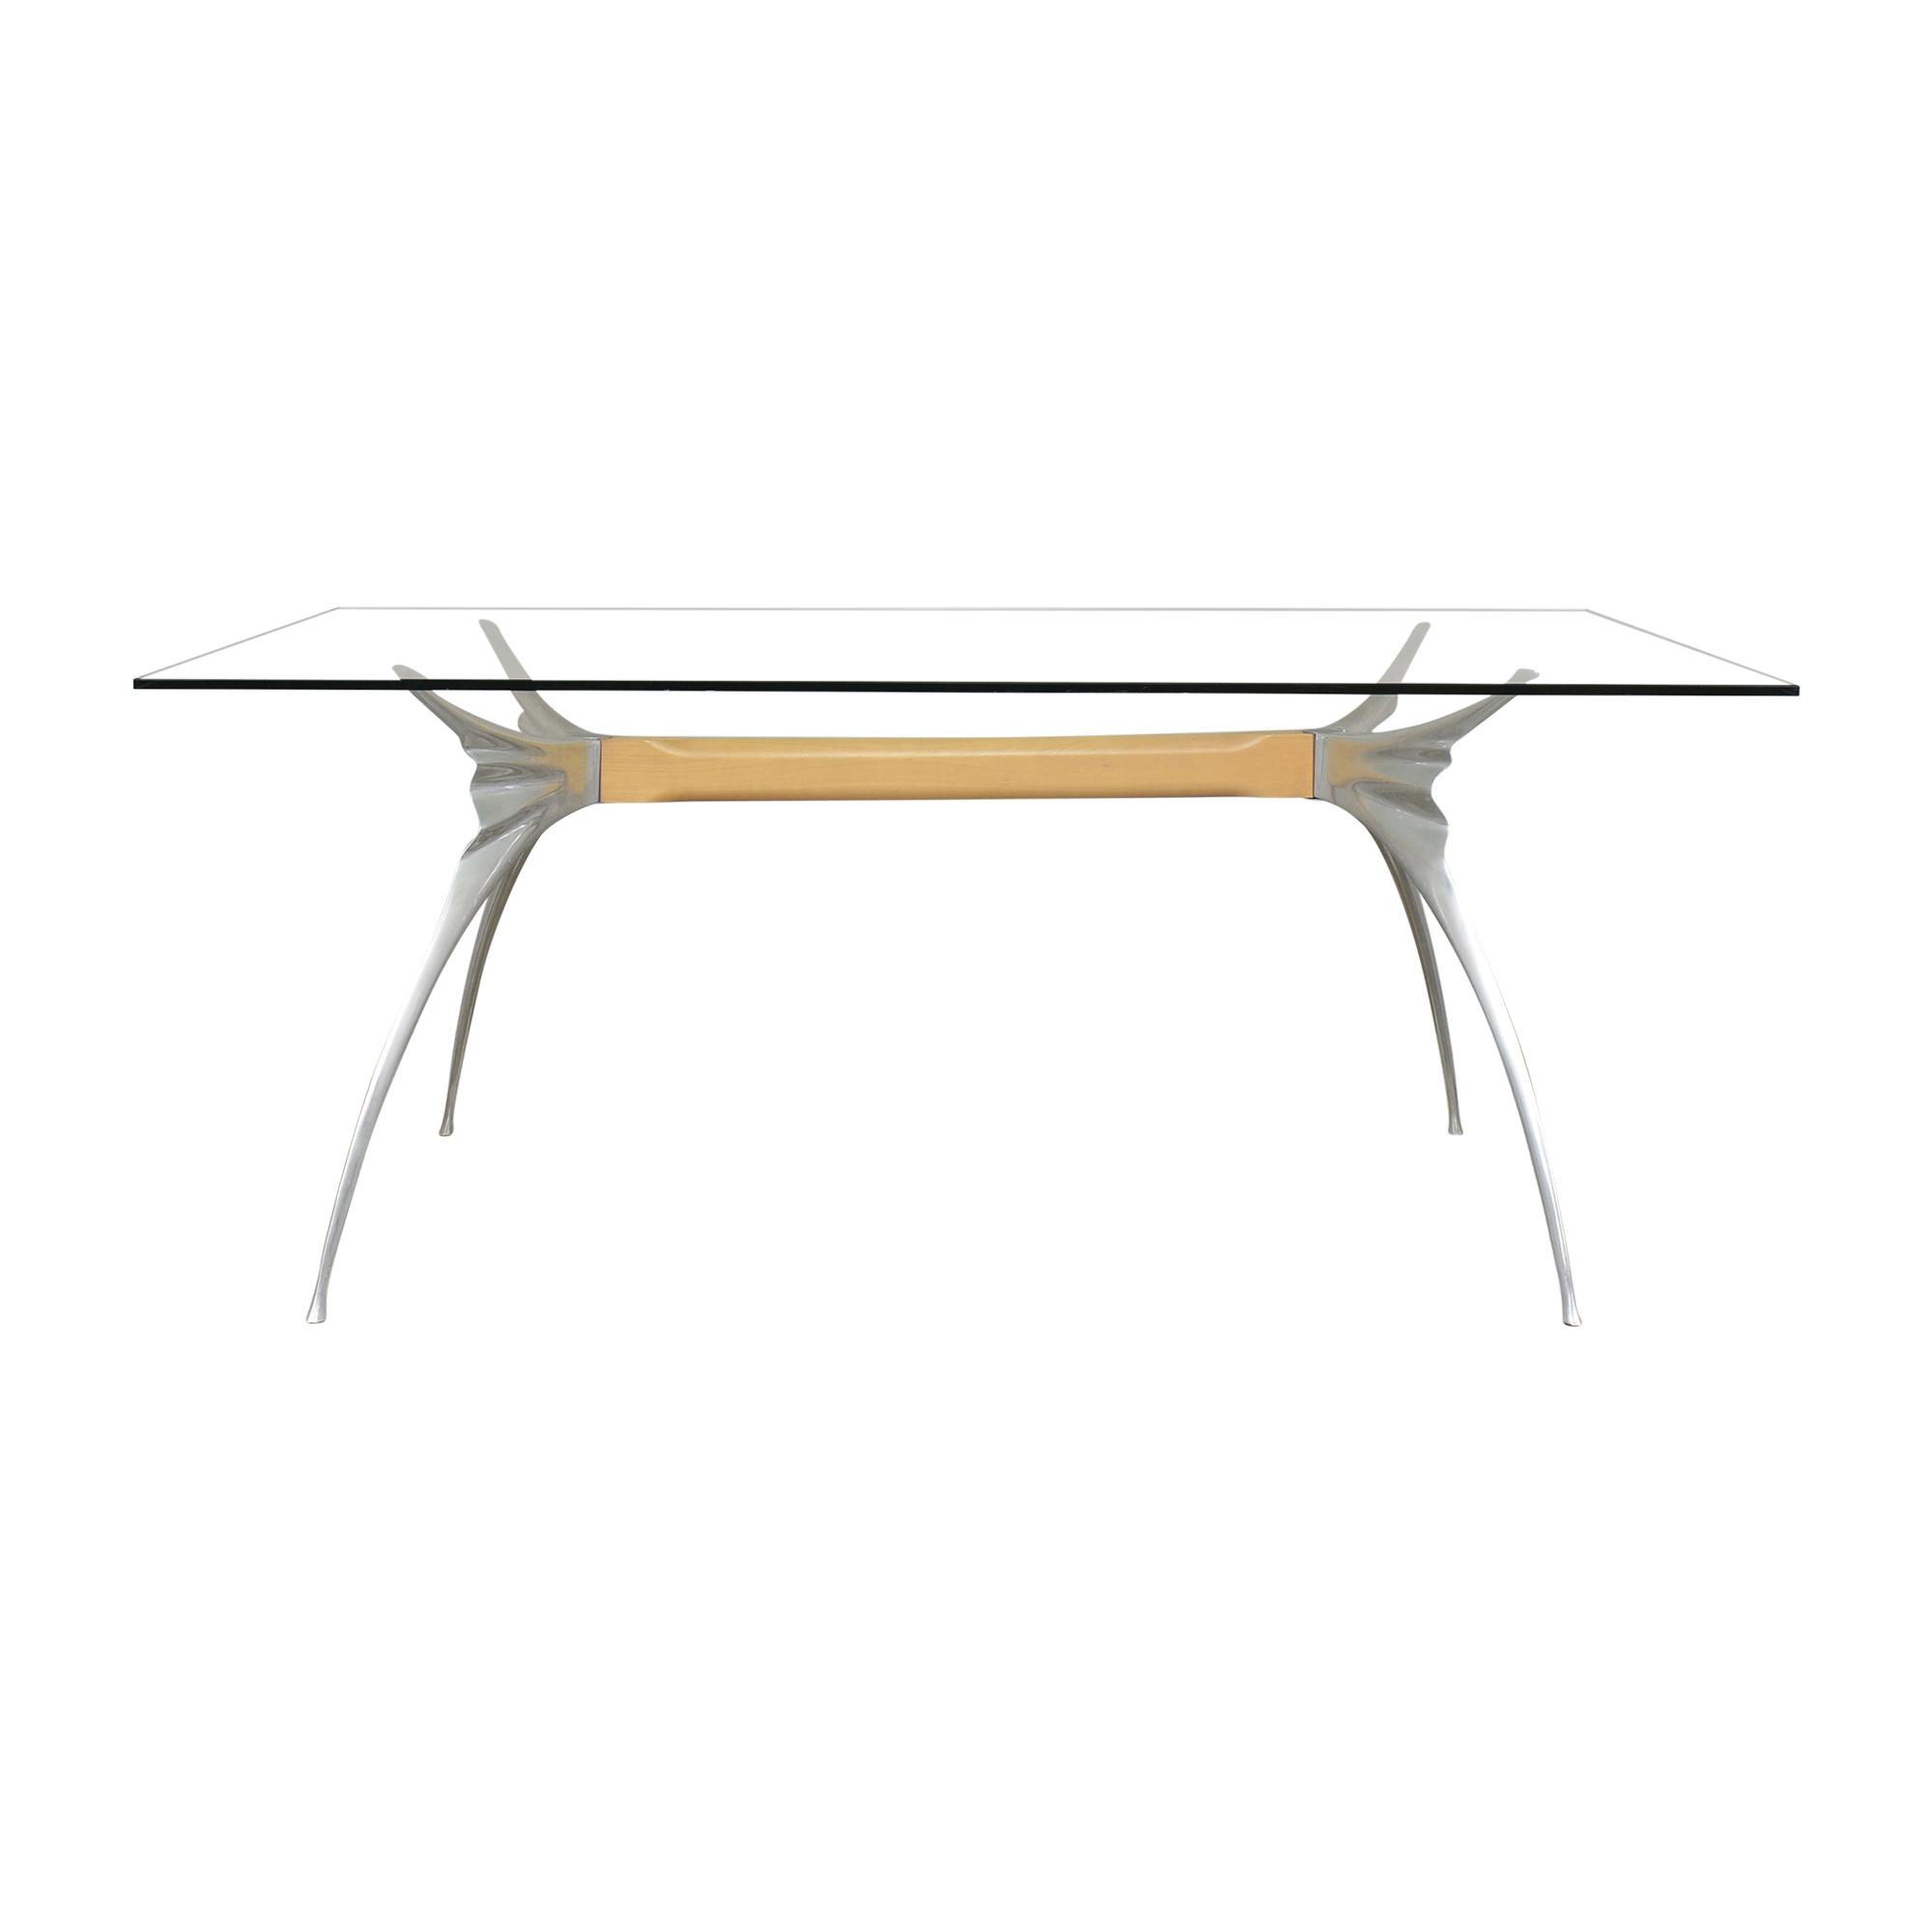 Protis Protis Transparent Dining Table used